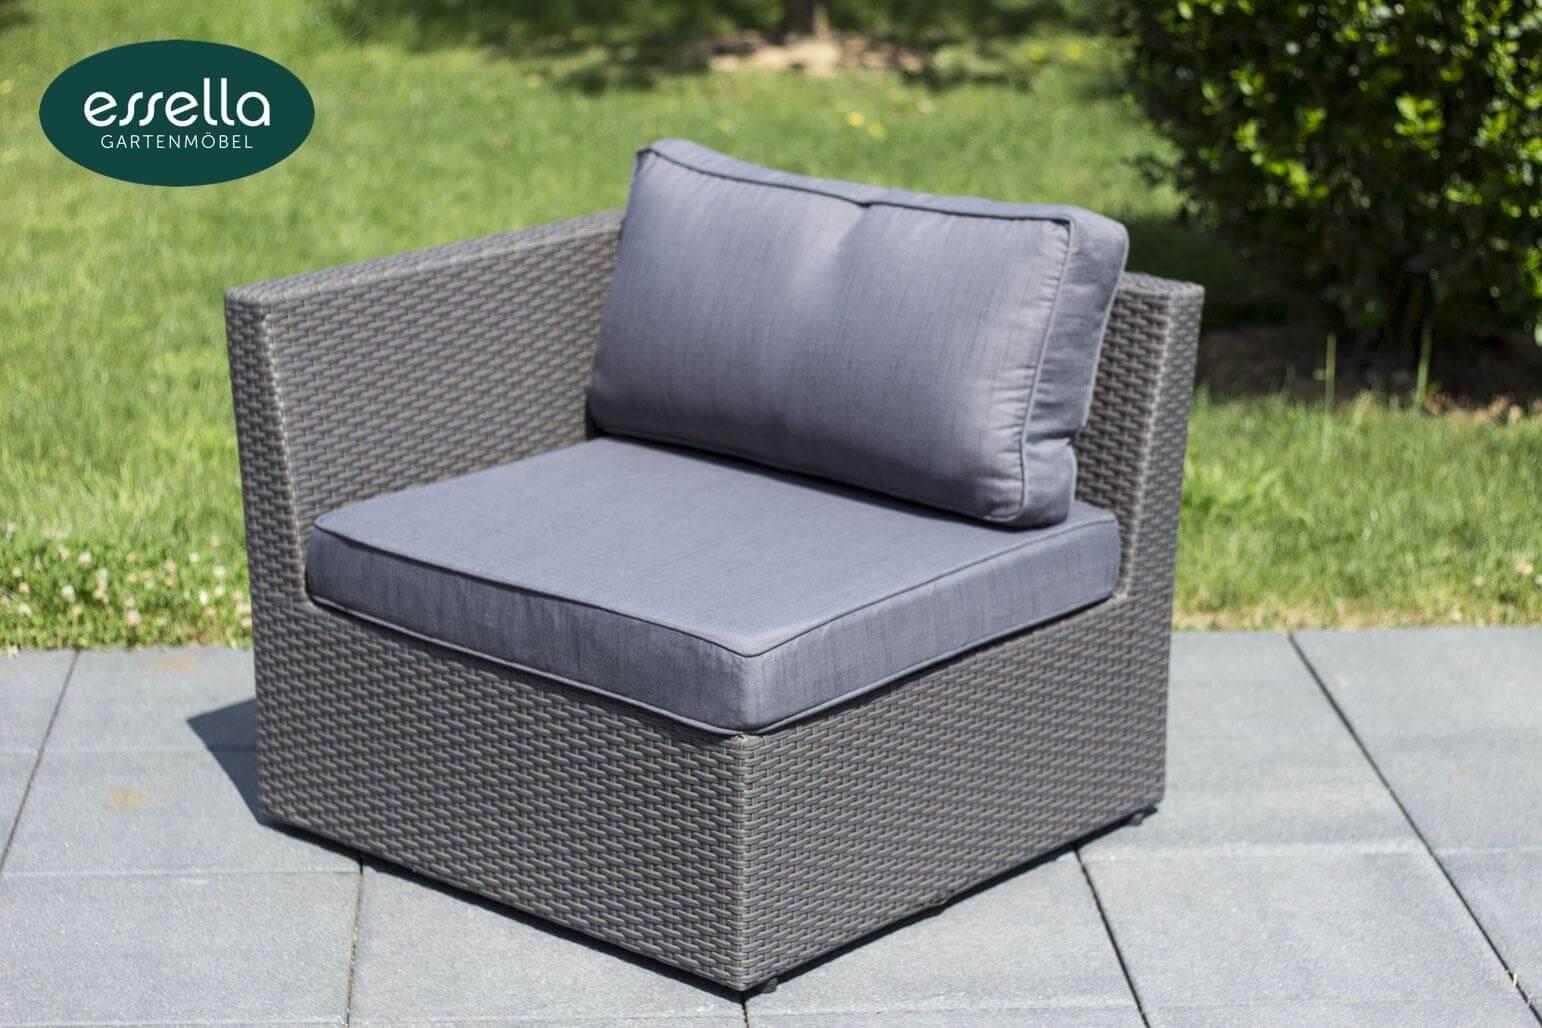 vorschau essella polyrattan lounge venezia grau flachgeflecht. Black Bedroom Furniture Sets. Home Design Ideas